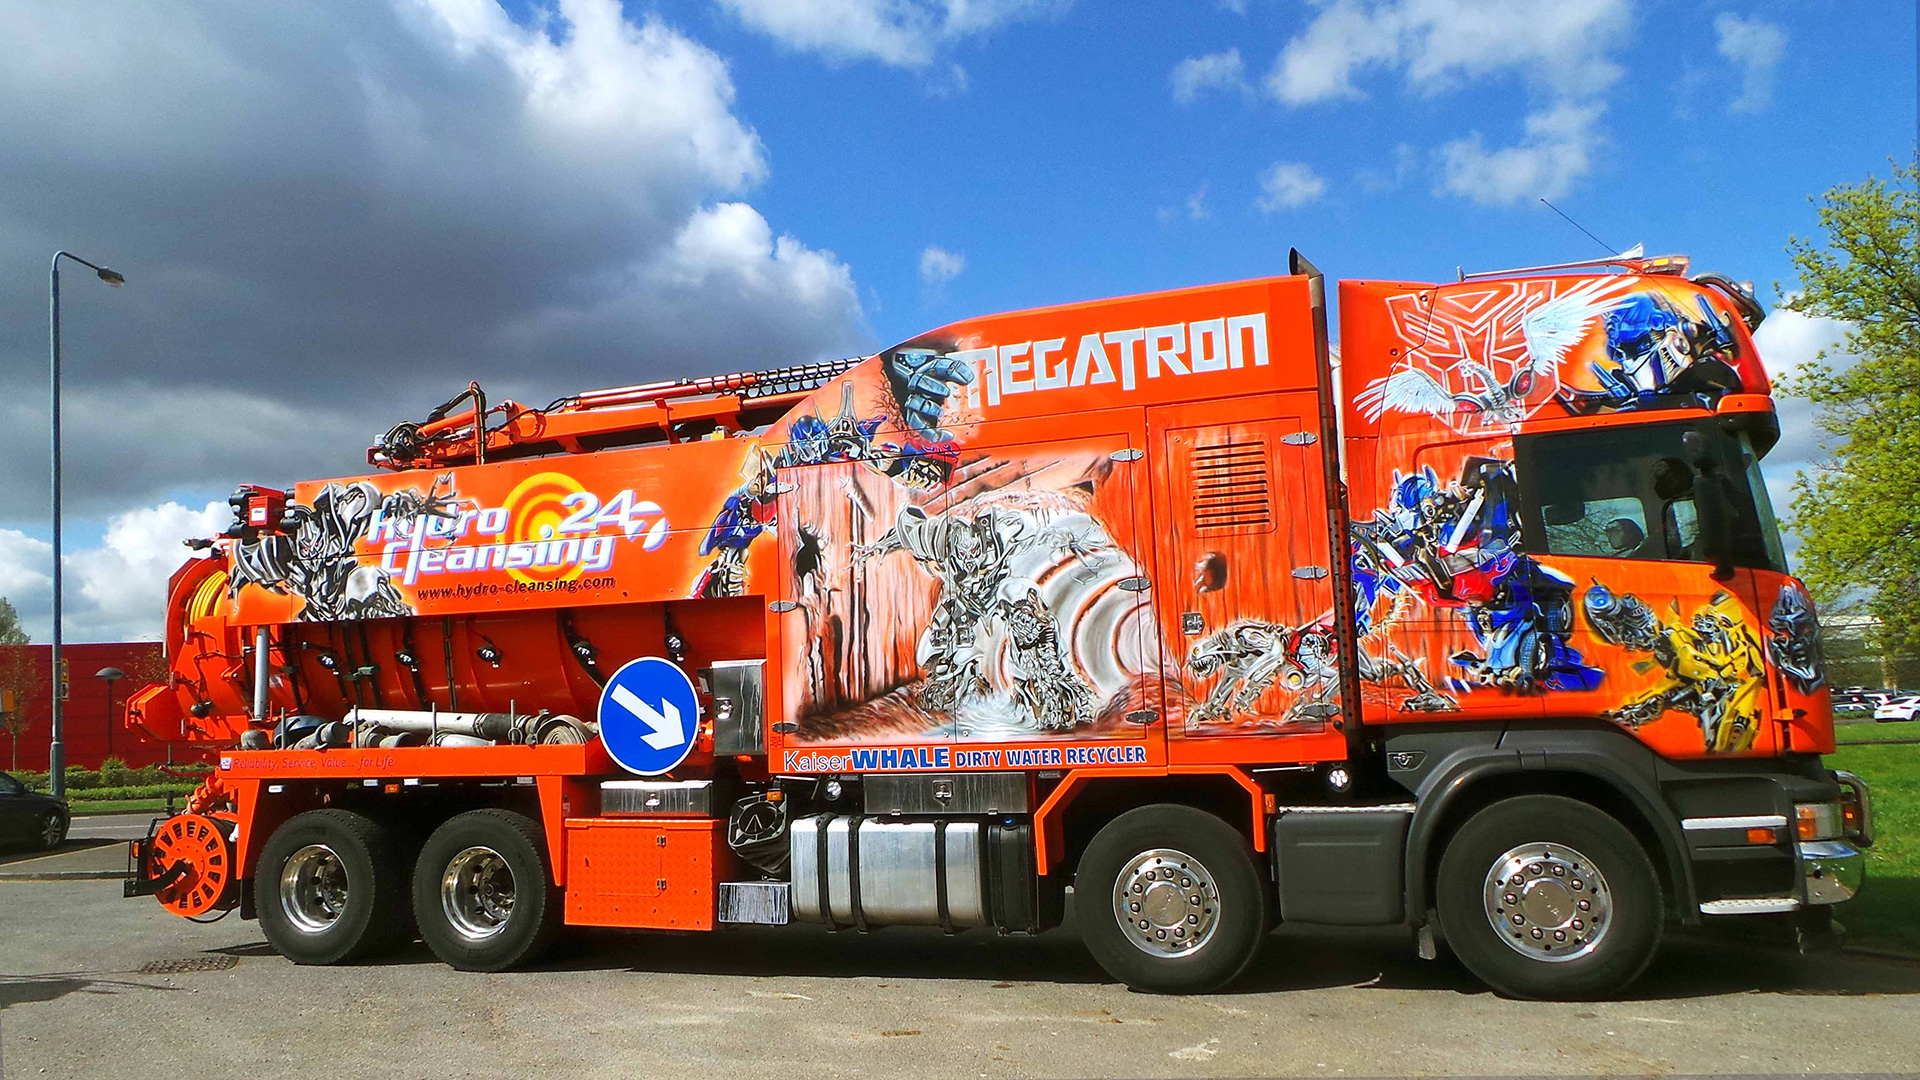 «Terminator»: грузовик-ассенизатор стоимостью 1 млн. евро 2